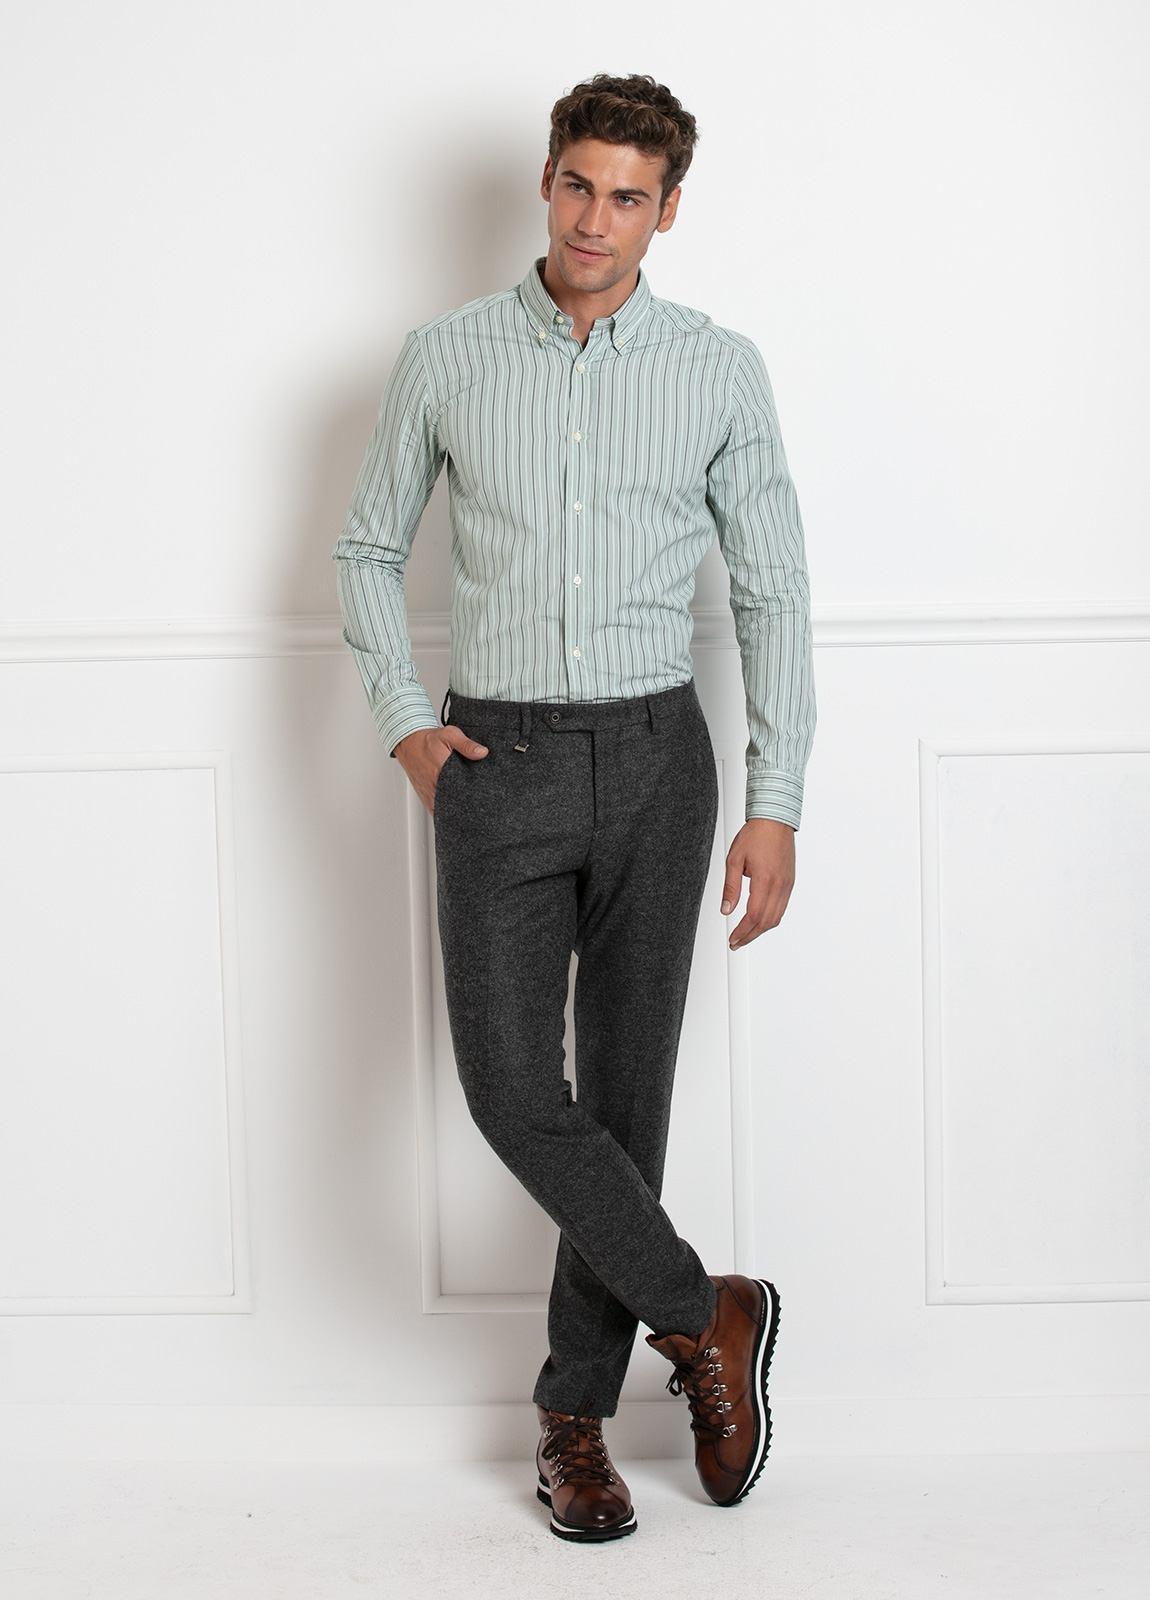 Camisa Leisure Wear SLIM FIT Modelo BOTTON DOWN color verde, estampado rayas gris. 100% Algodón. - Ítem2